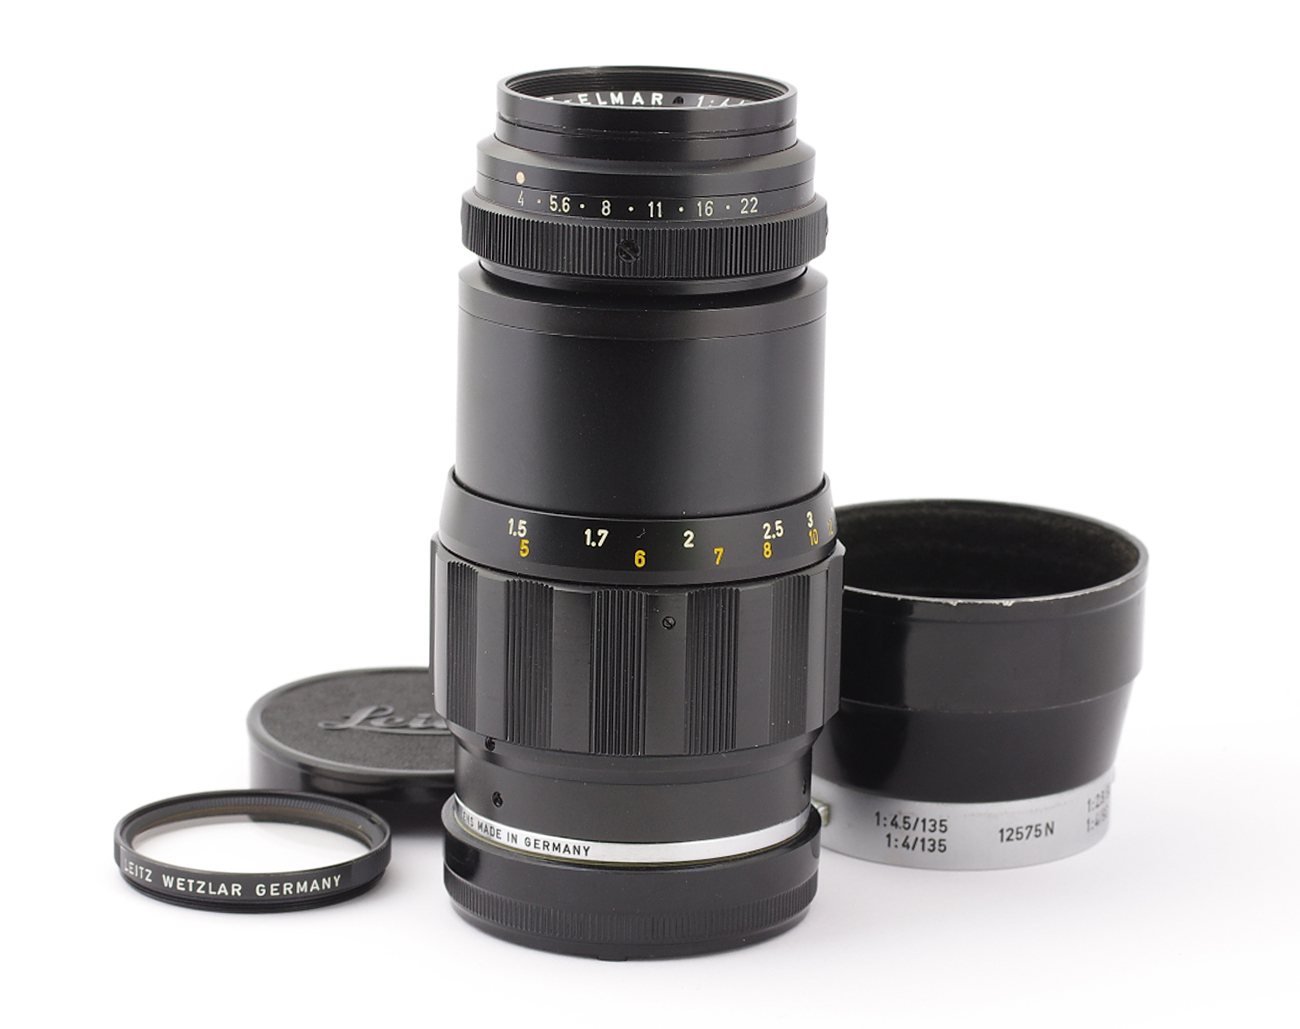 Leica-M-Tele-Elmar-4-135-mm-2207446-Germany-Lens